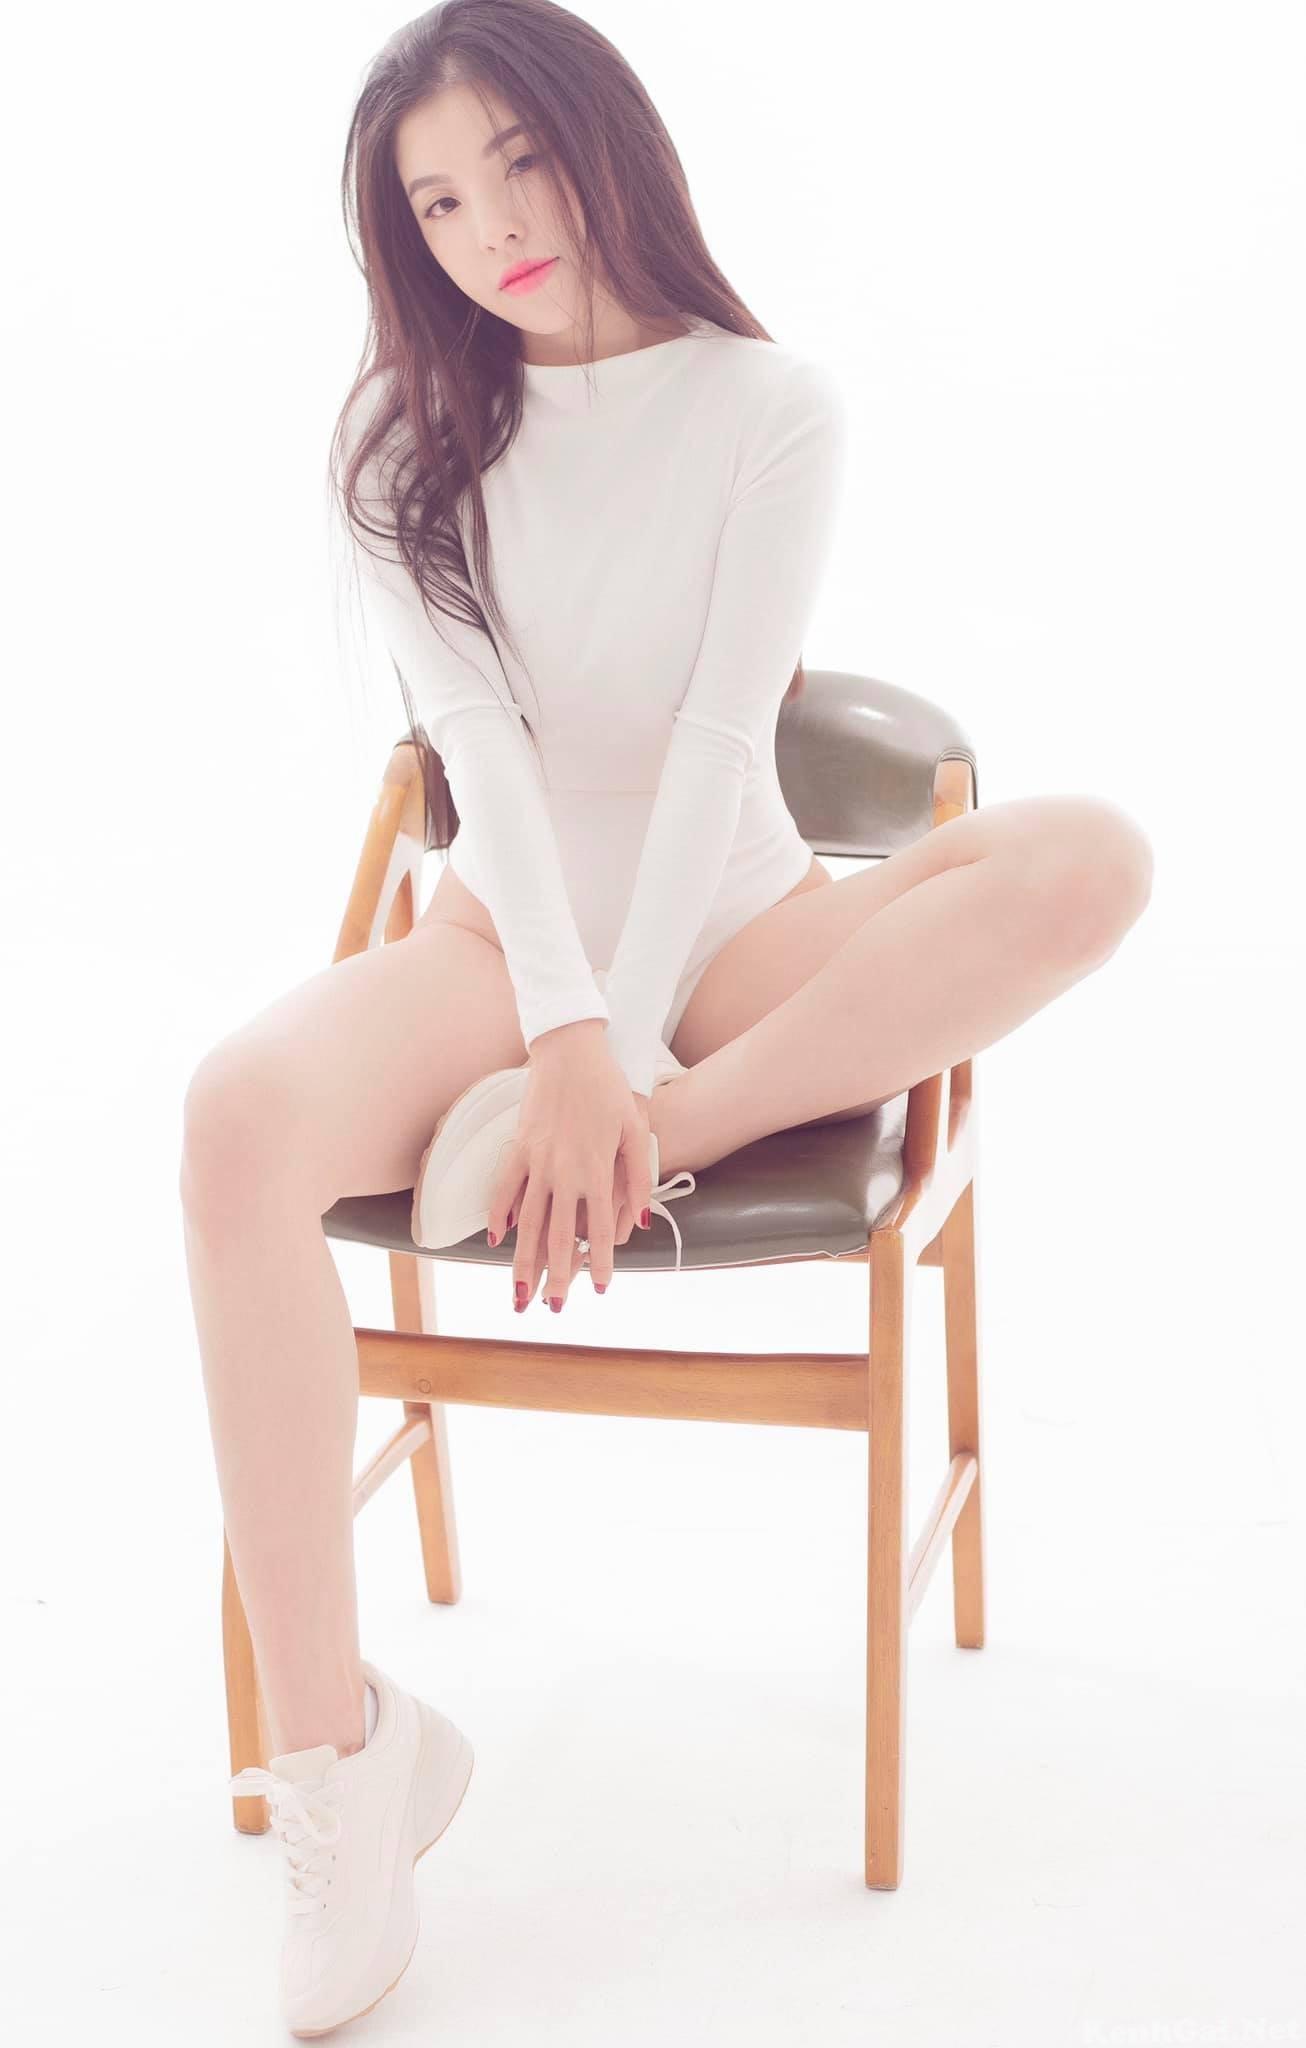 Hotgirl Hotgirl Lê Mai   E-CUP